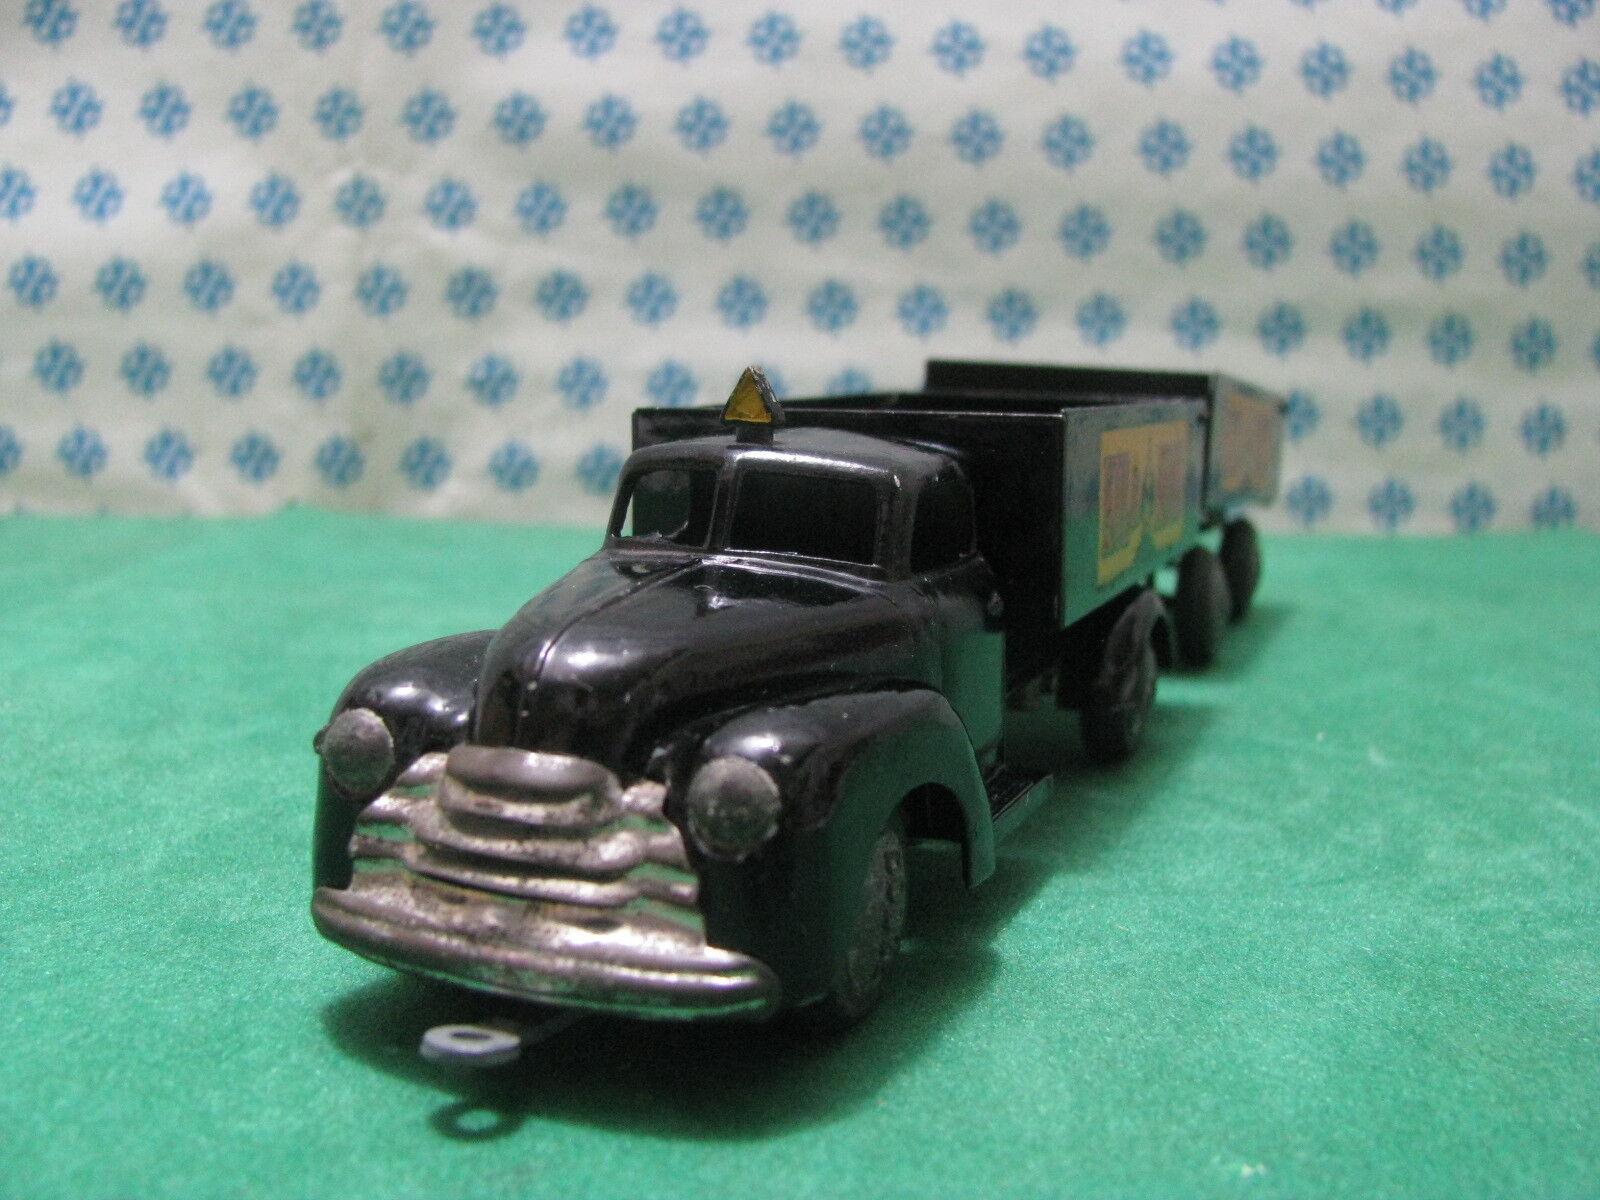 TEKNO DANEMARK 736 DODGE  Kul et et et Koks  camion-remorque -grande condition 84ca4b